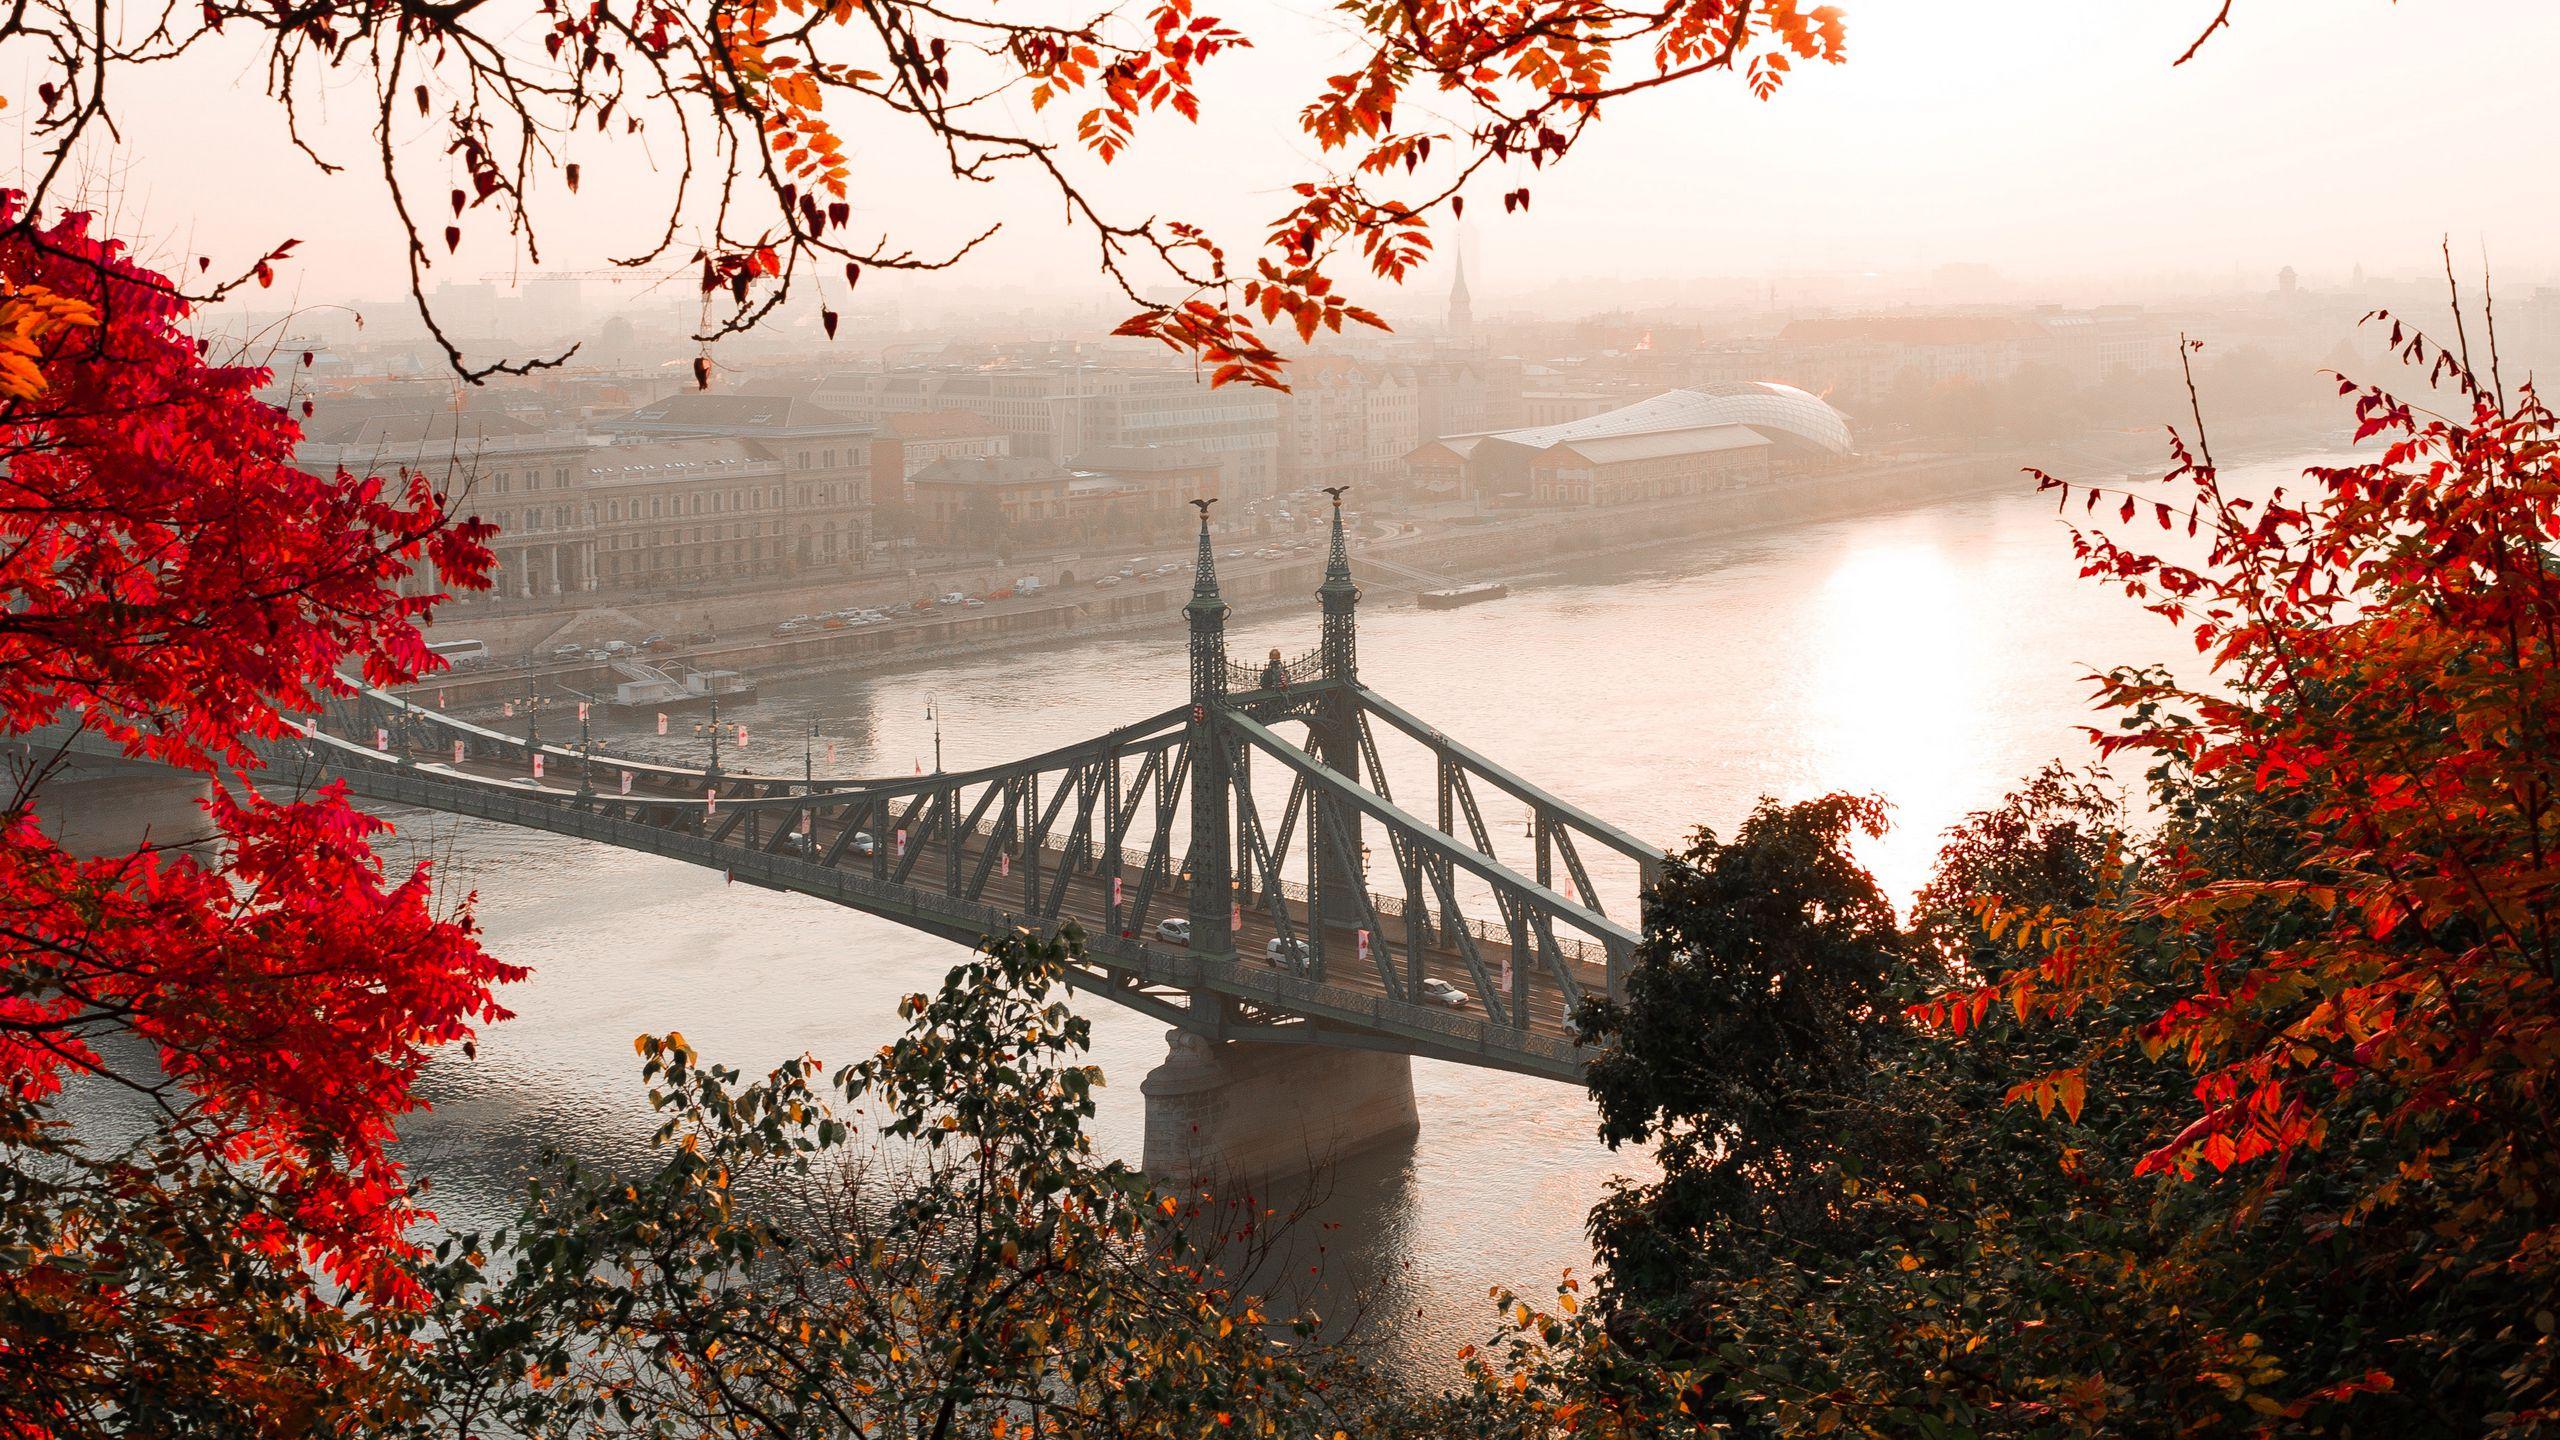 2560x1440 Wallpaper bridge, autumn, city, citadella, budapest, hungary